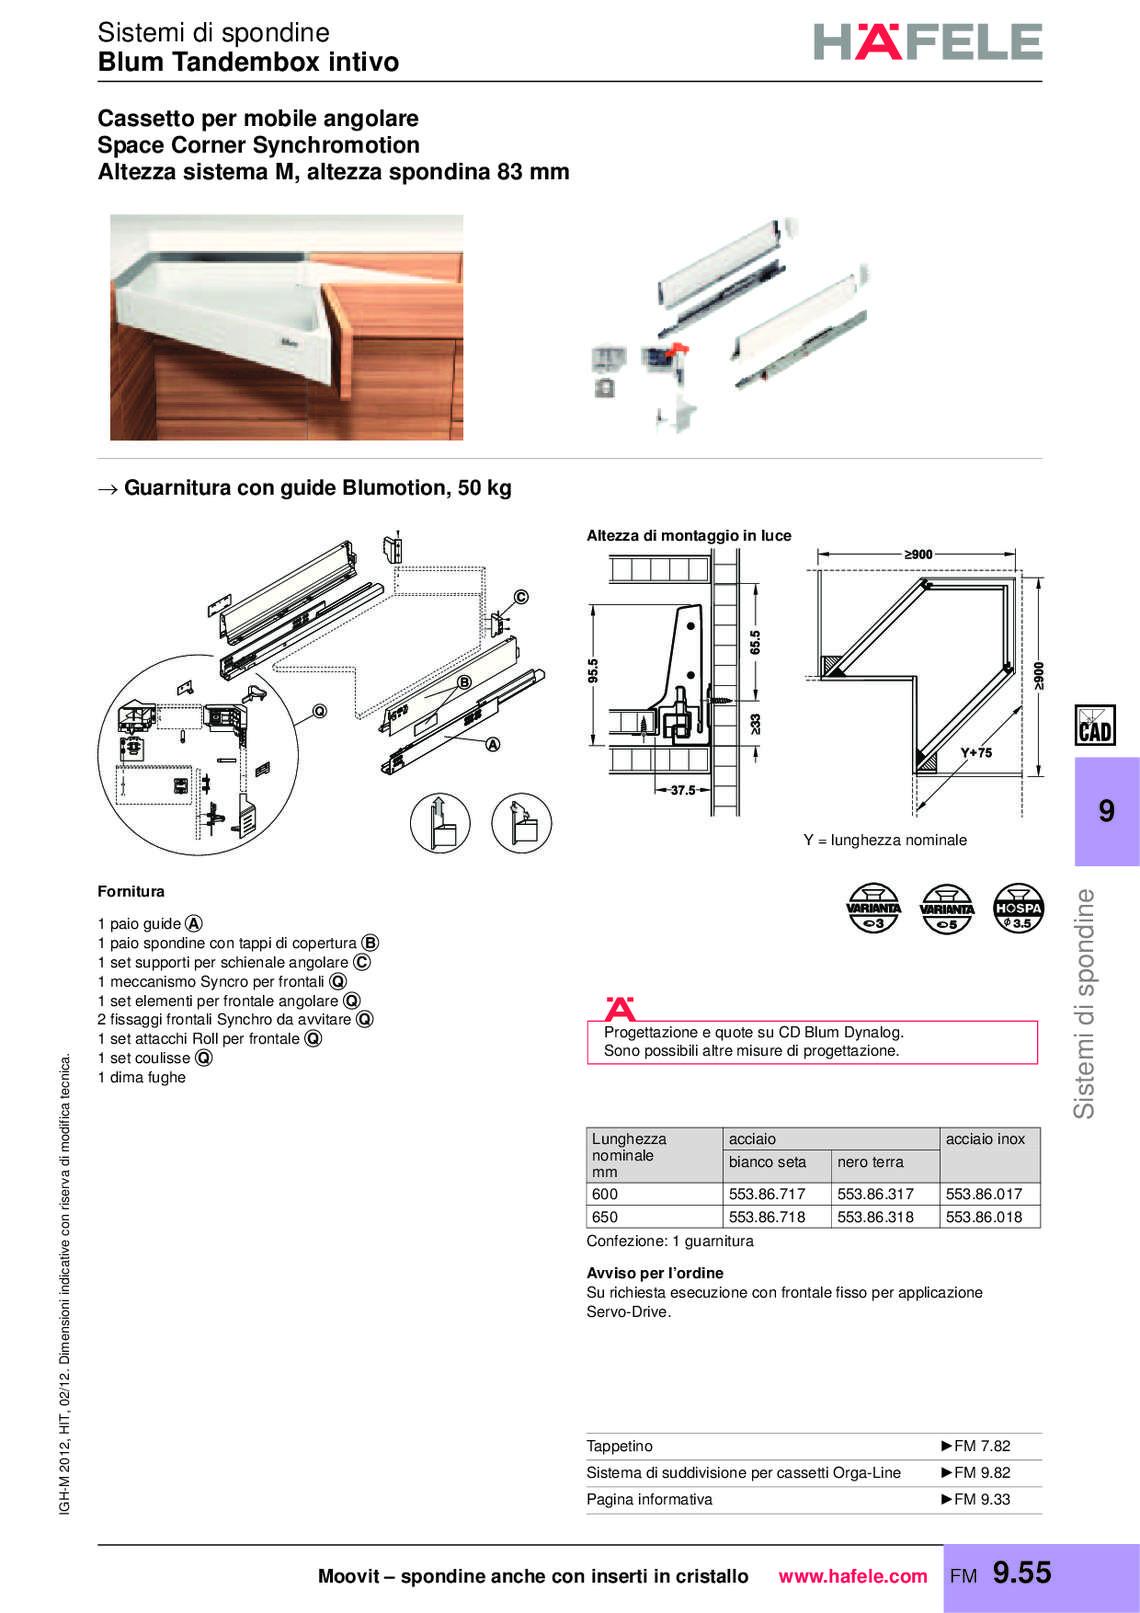 hafele-spondine-e-guide-per-mobili_40_068.jpg